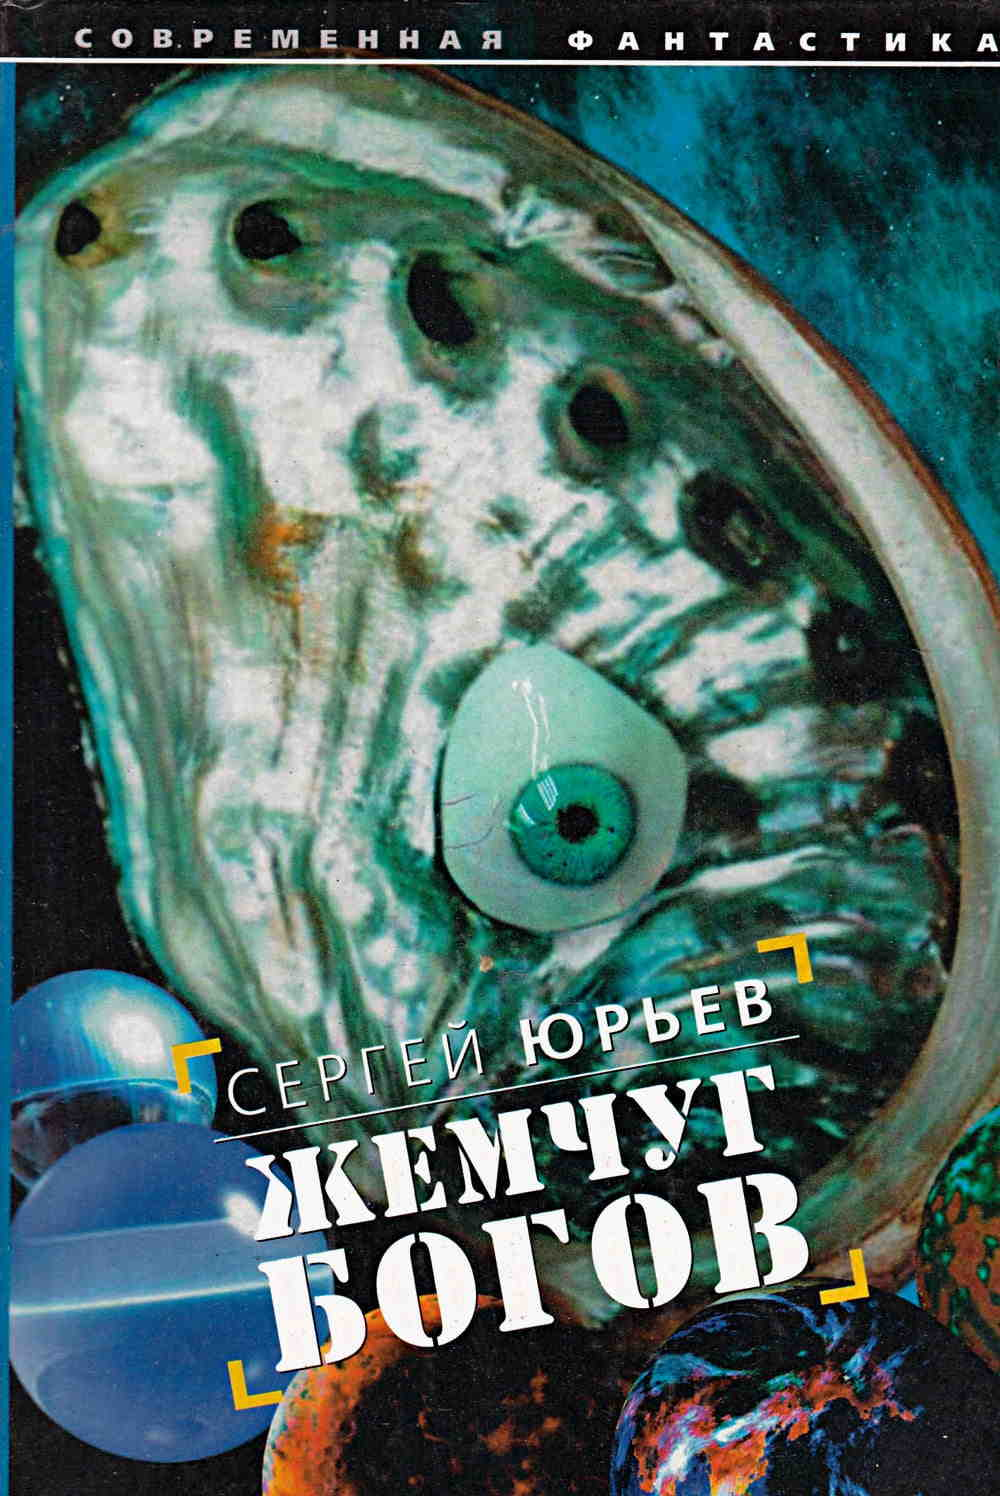 Юрьев Сергей - Жемчуг богов